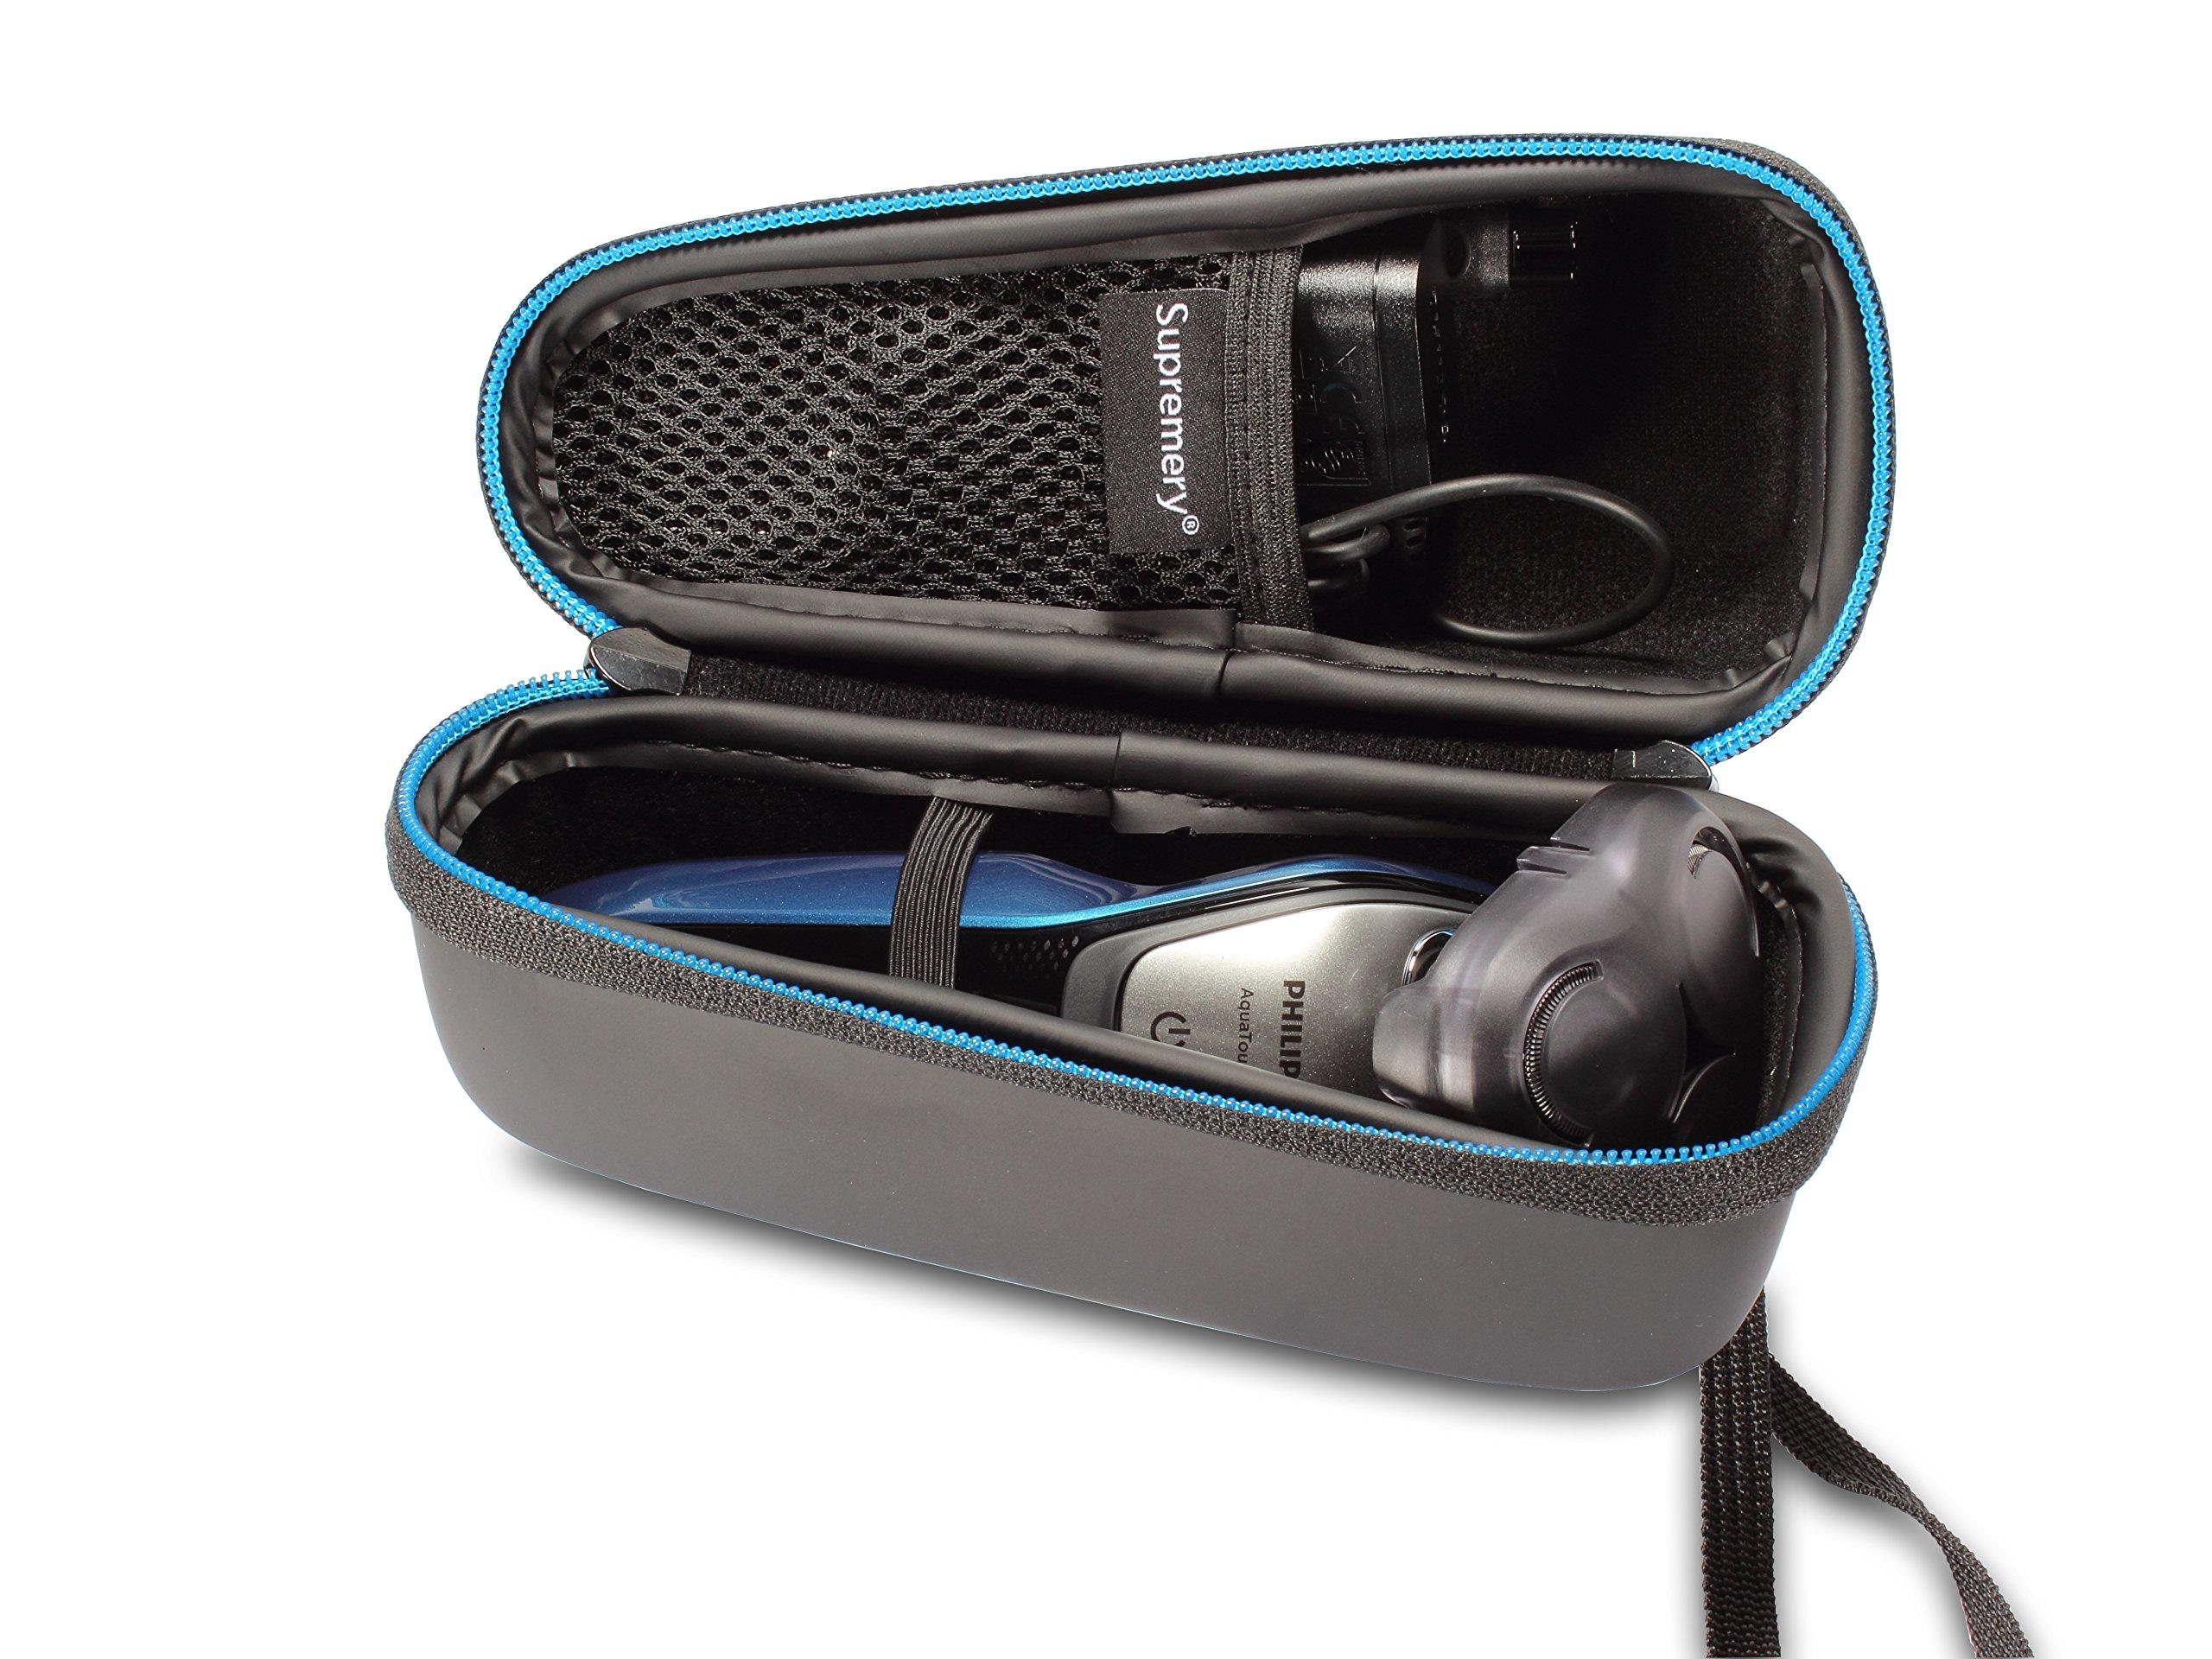 Supremery Bolsa para Philips AquaTouch S5420/06, S5320/06, S7370 ...